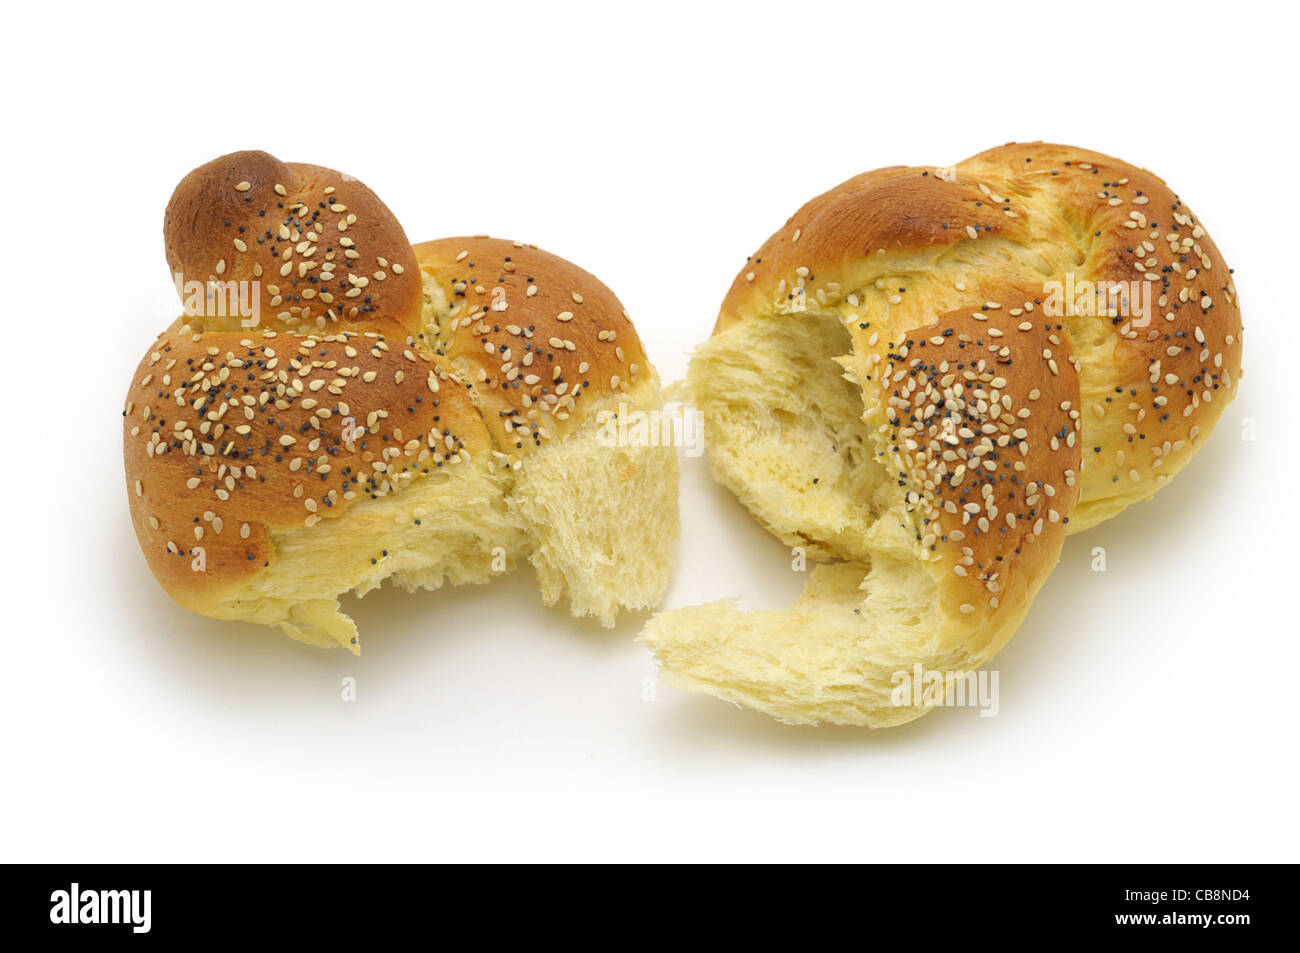 Twist, 'Egg Twist' Bun, Bread - Stock Image